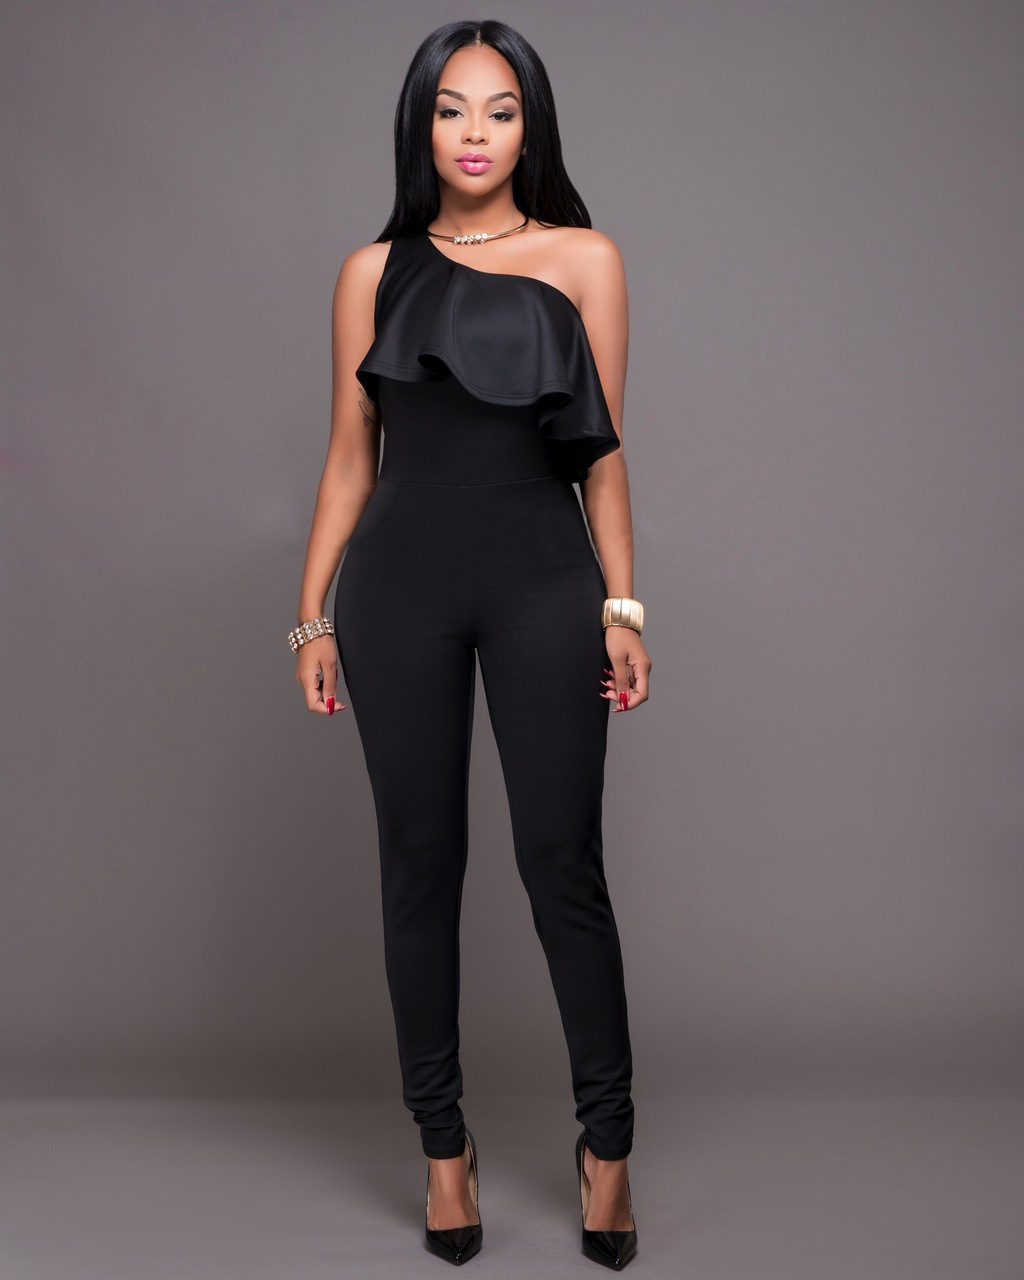 f343d5c1fbe9 Amazon Rompers Womens Jumpsuit Overalls Bodysuit model jumpsuit Long Pants  Bodycon Jumpsuits Women 2018 Bodys Para Mujeres Tuta